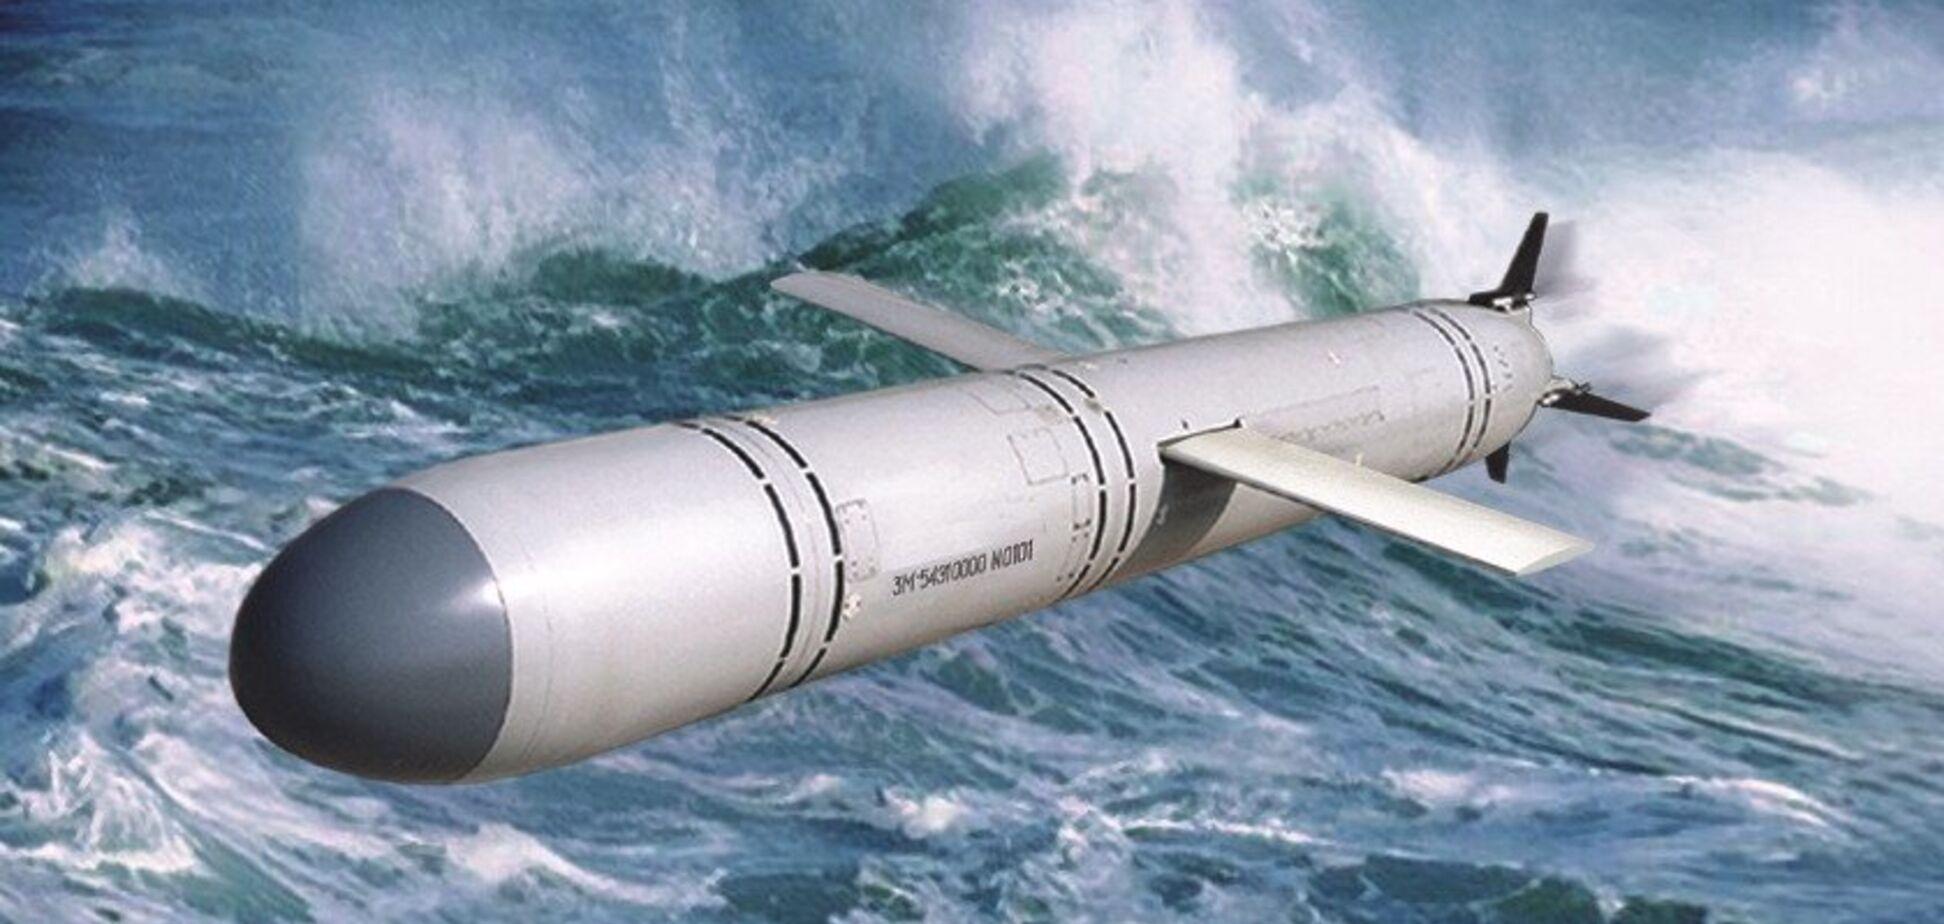 крылатые ракеты россия